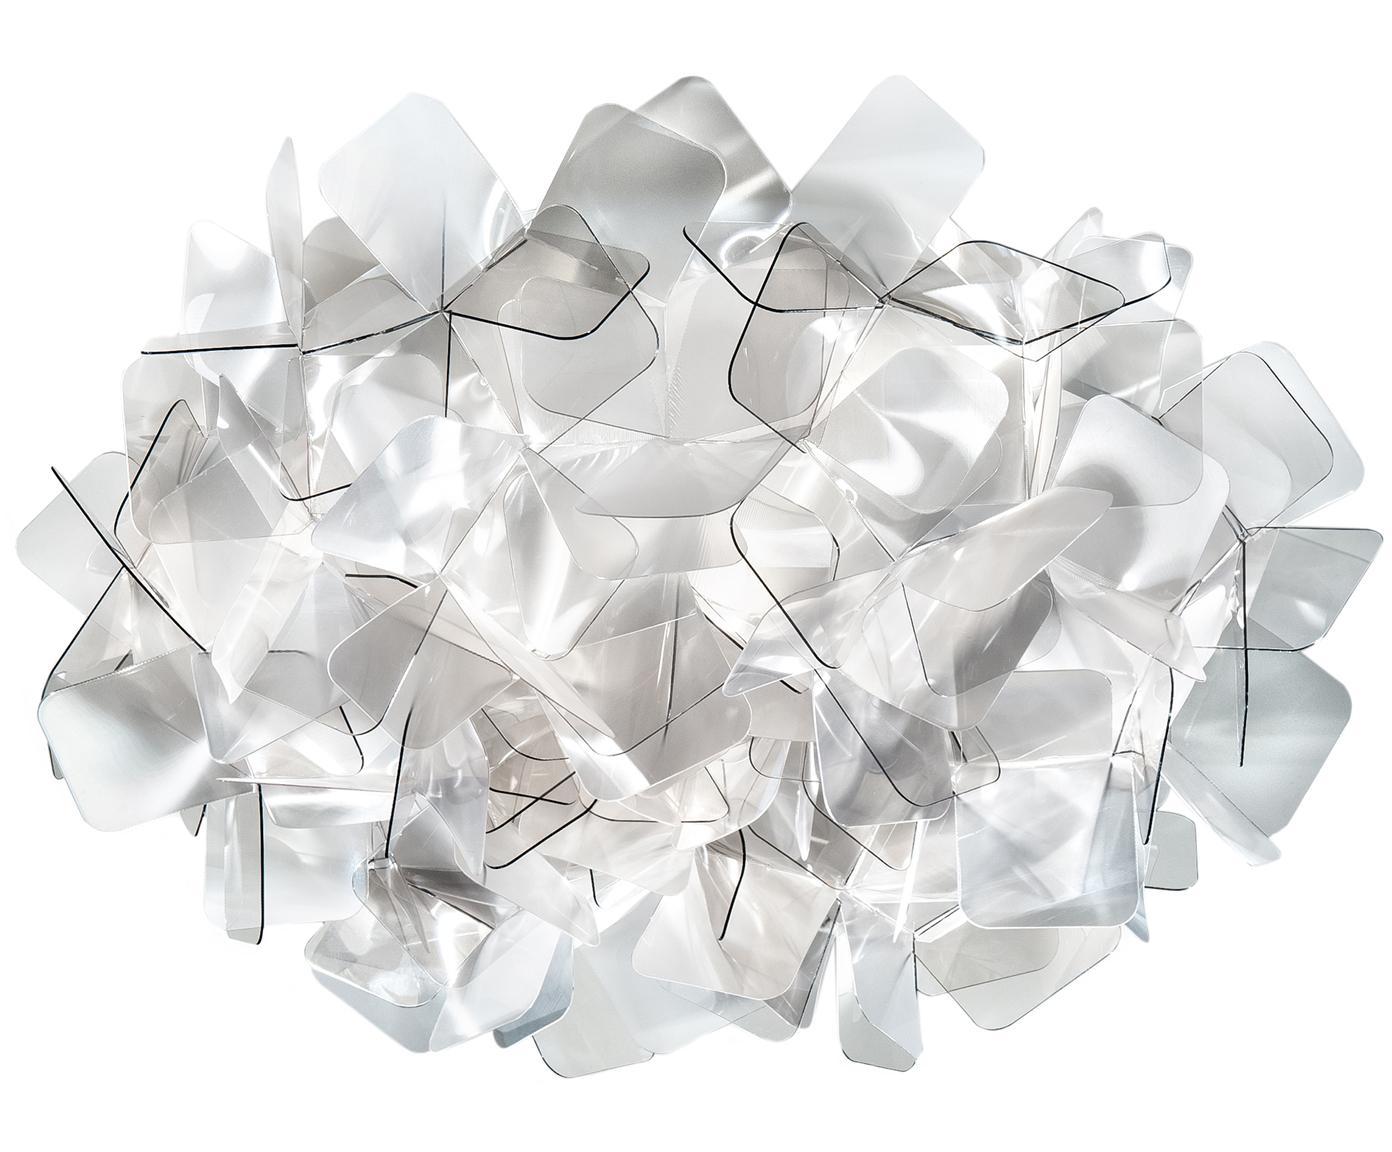 Handgemaakte wand- en plafondlamp Clizia, Technopolymeer Lentiflex®, lichtbrekend en Cristalflex®, onbreekbaart, flexibel, Lichtgrijs, transparant, Ø 32 x H 15 cm